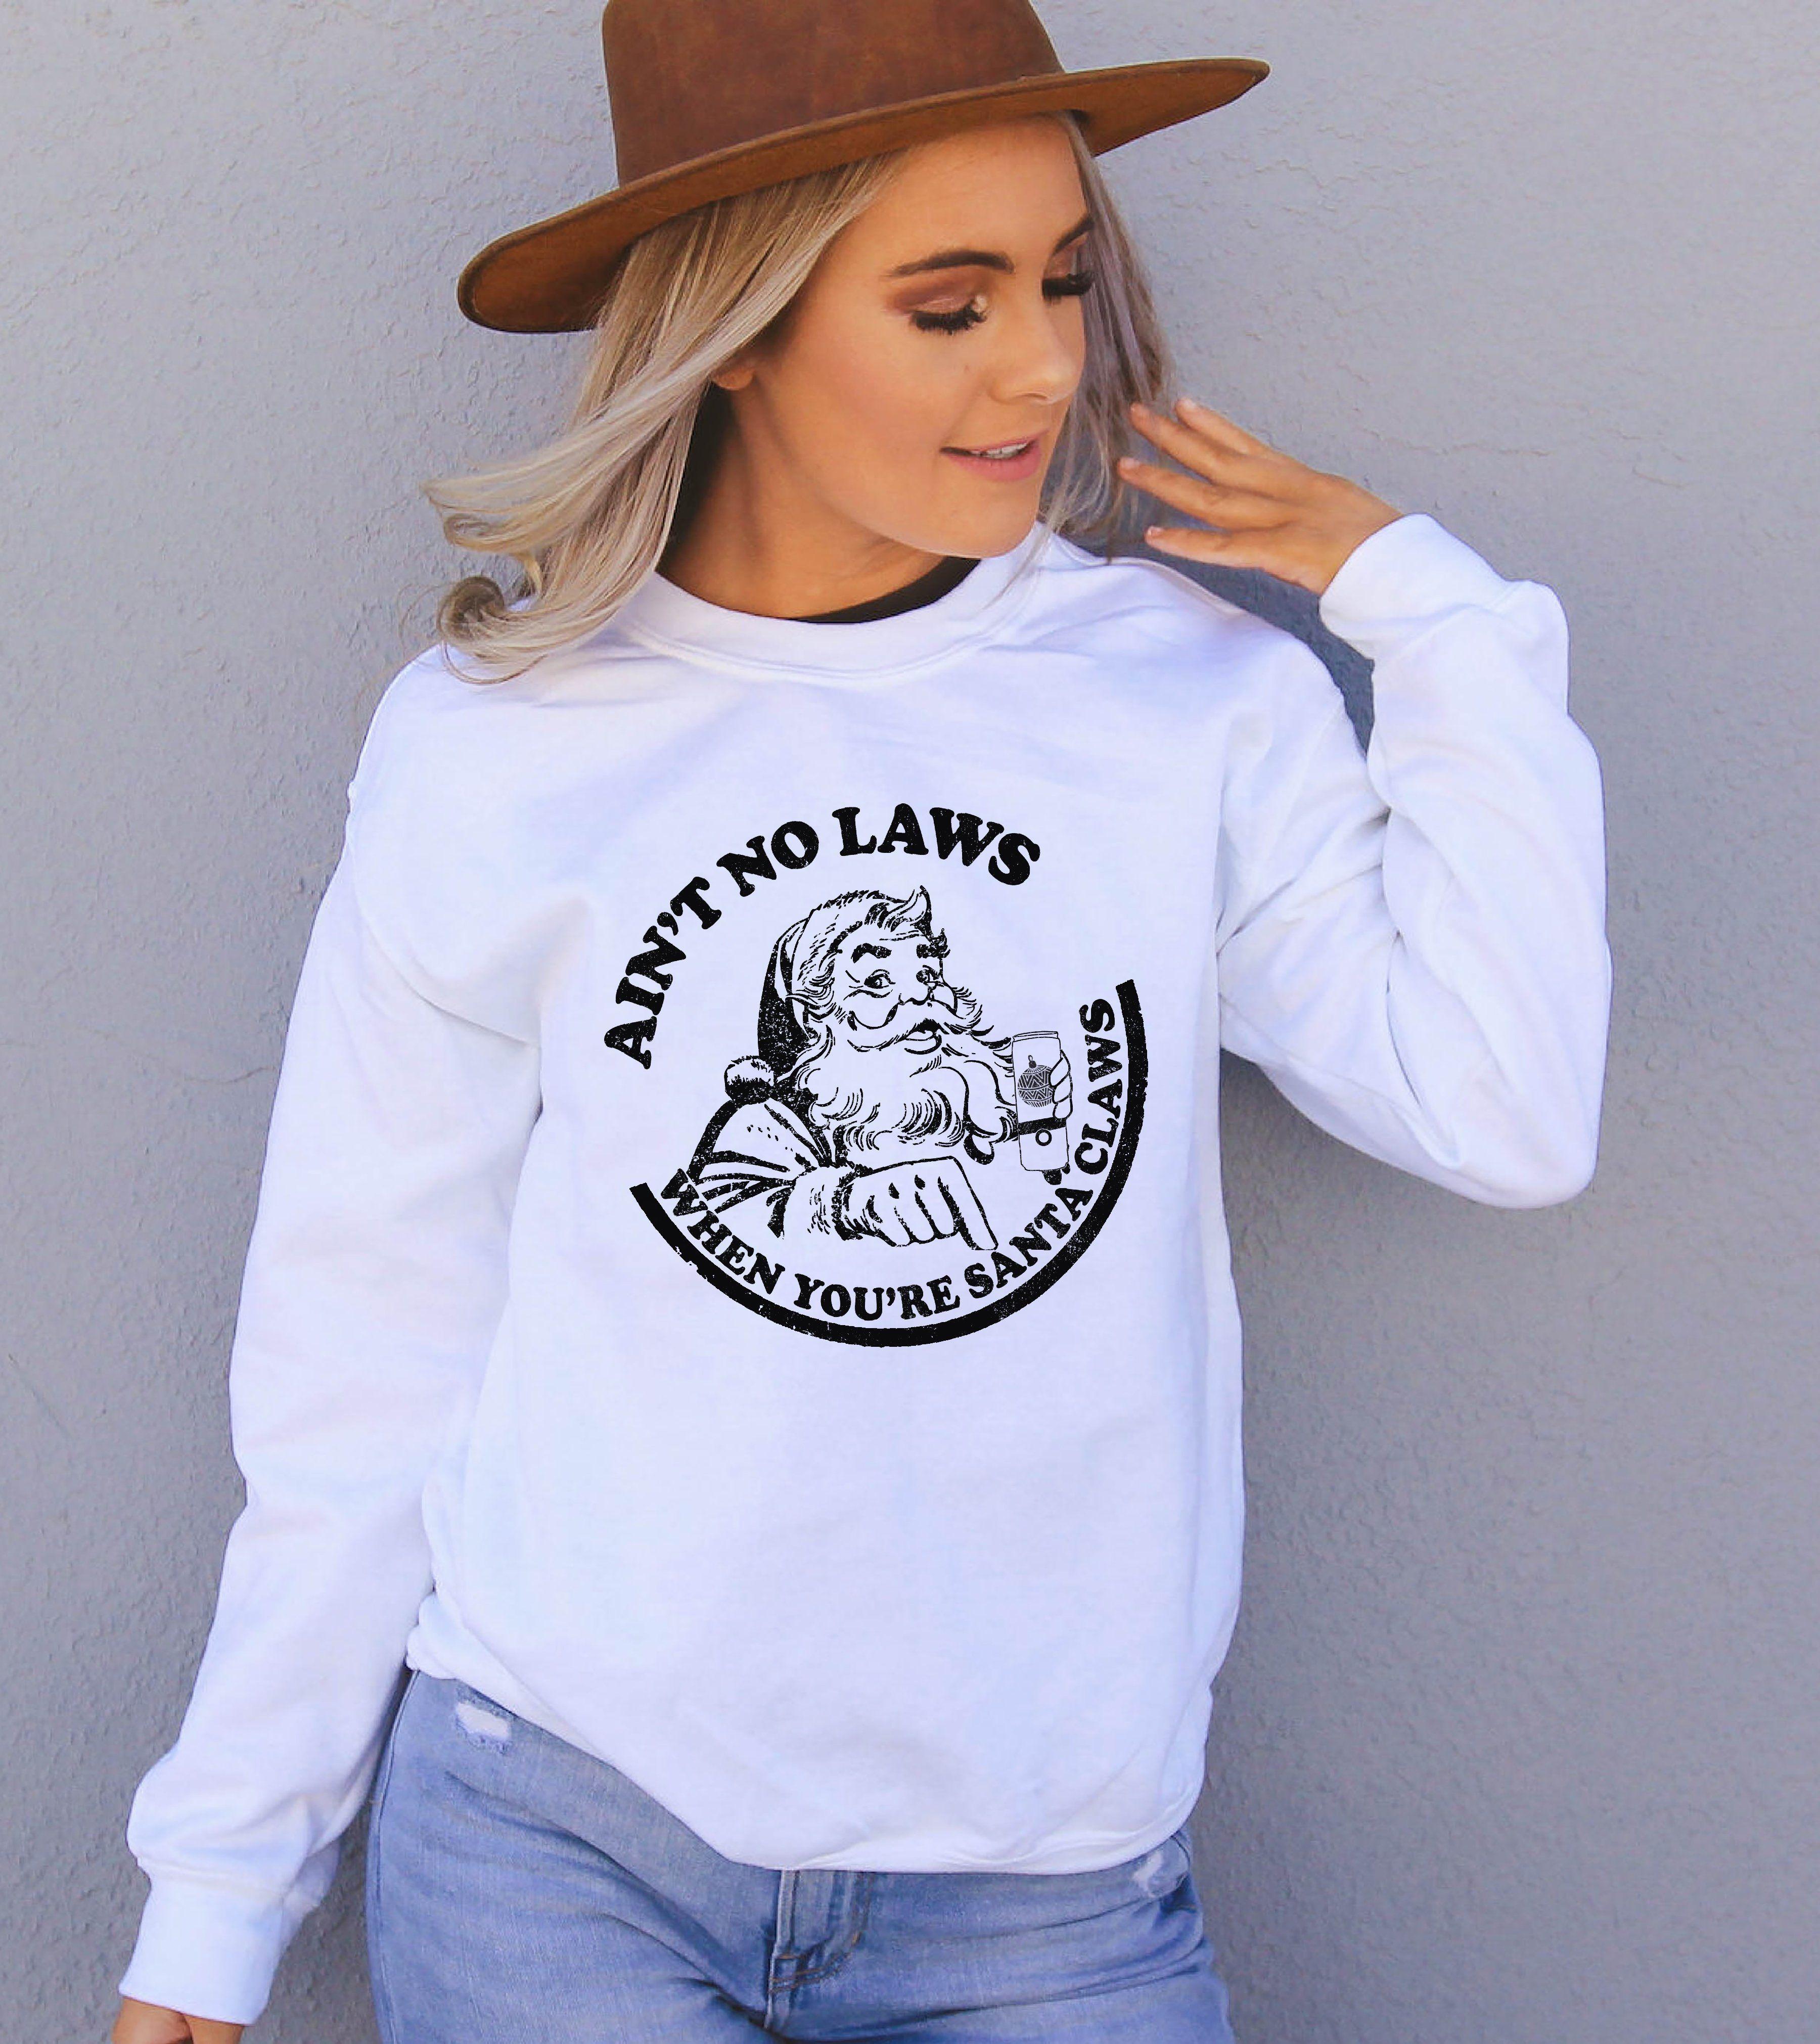 Ain T No Laws When You Re Santa Claws Shirt White Claw Christmas Shirt Highciti Funny Christmas Sweaters Sweatshirts Cozy Sweatshirts [ 4043 x 3600 Pixel ]